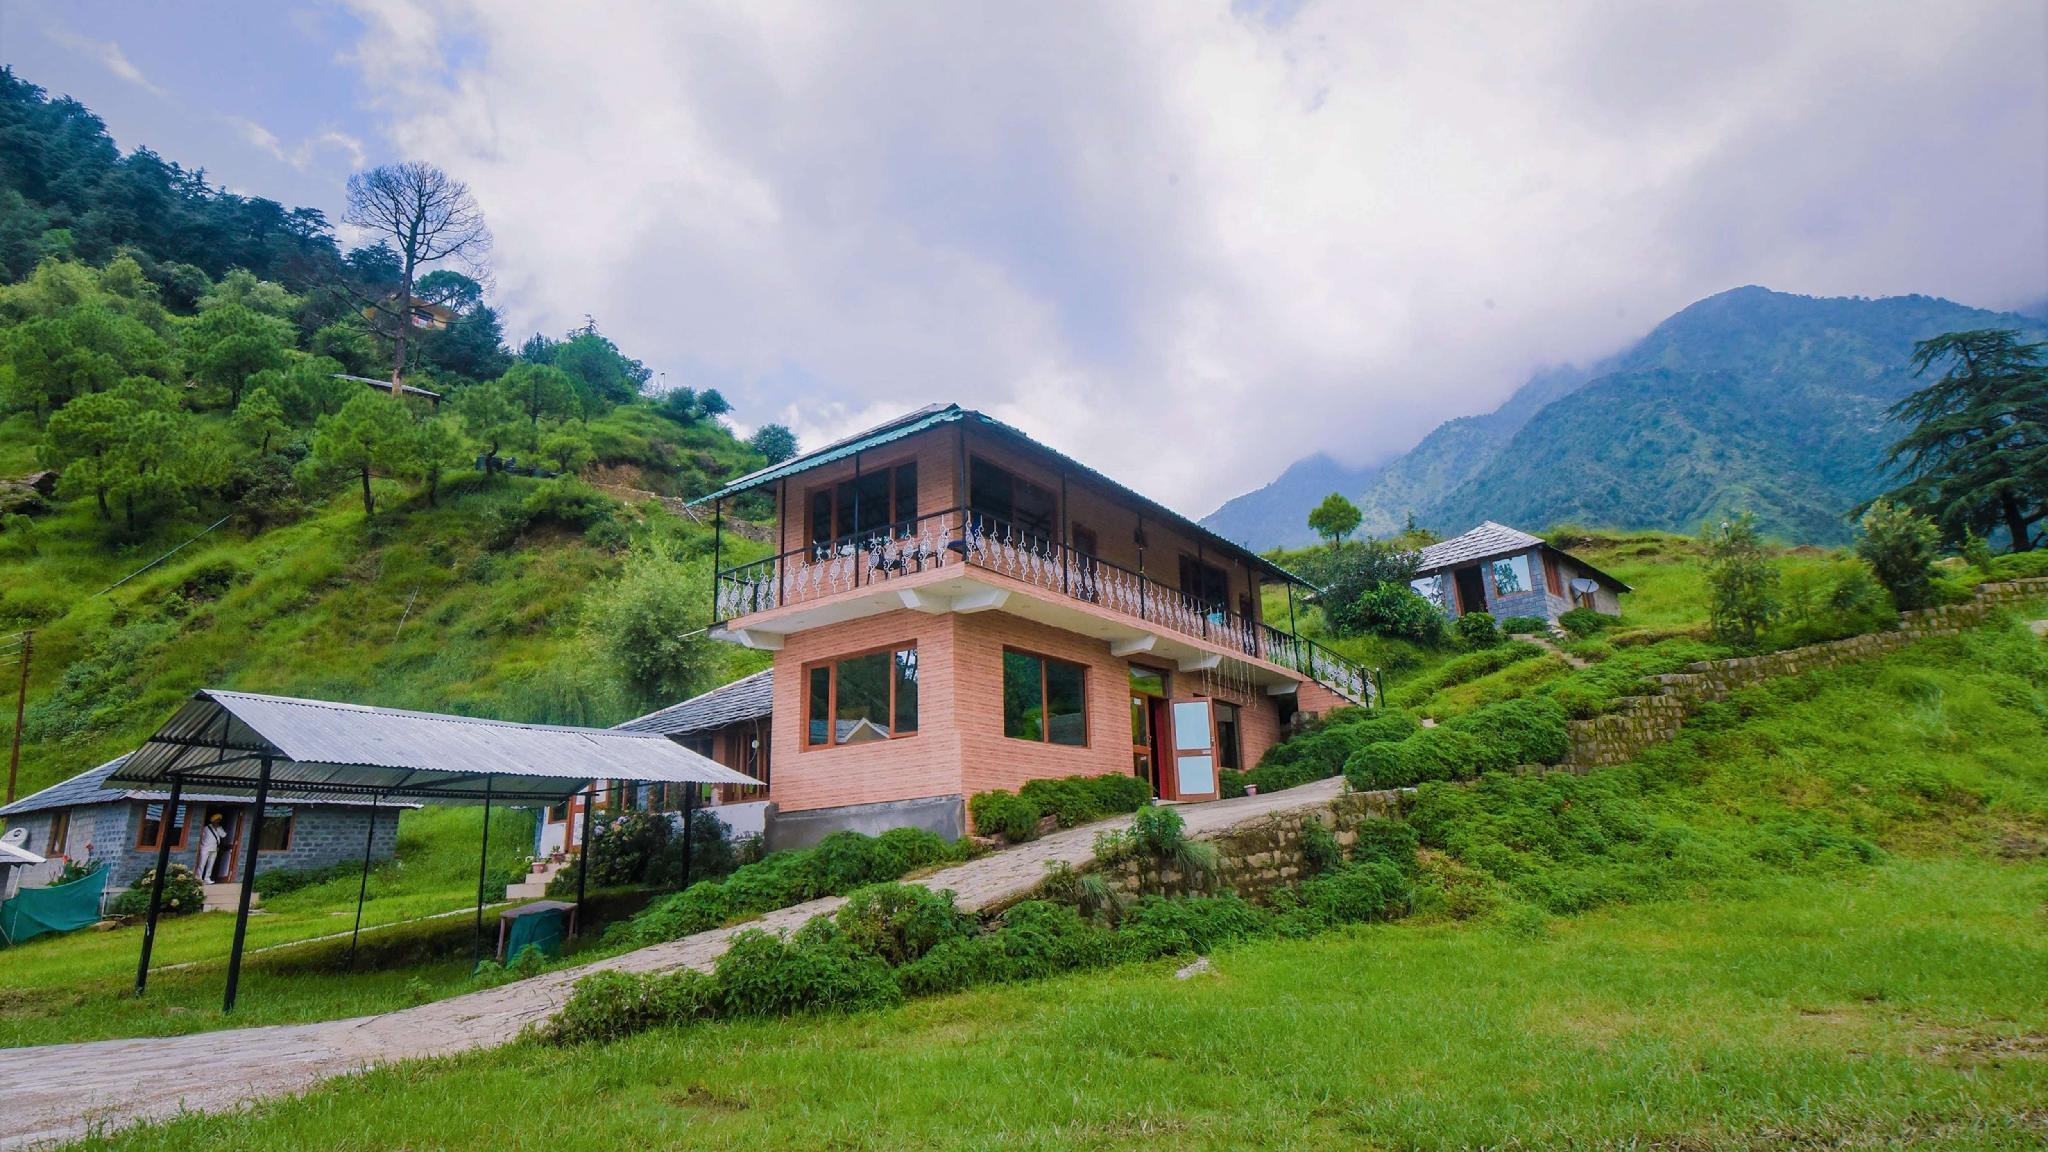 GenX Great Himalayan Resort Mcleodganj, Kangra